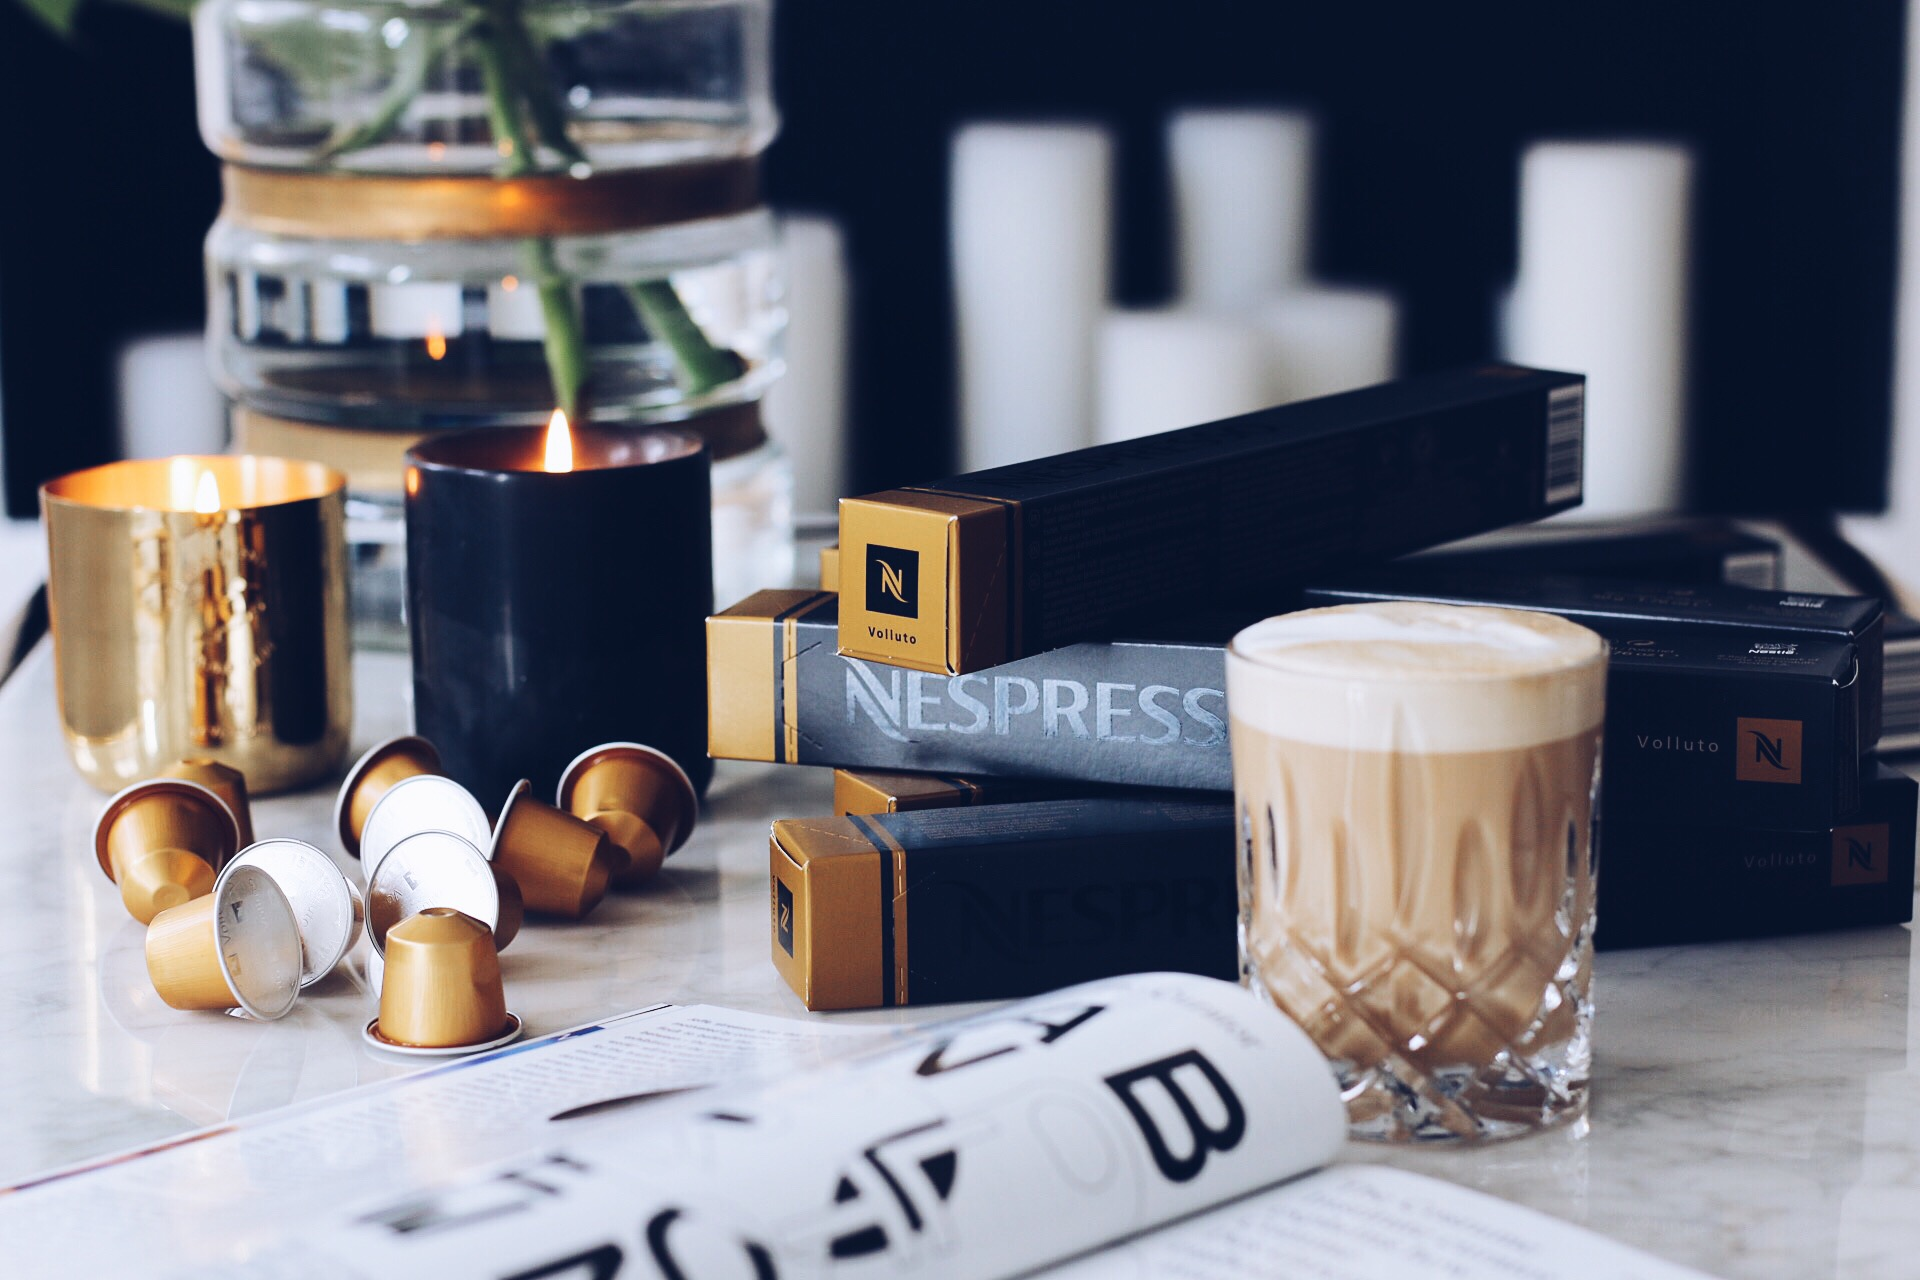 wo kommt mein nespresso kaffee eigentlich her. Black Bedroom Furniture Sets. Home Design Ideas